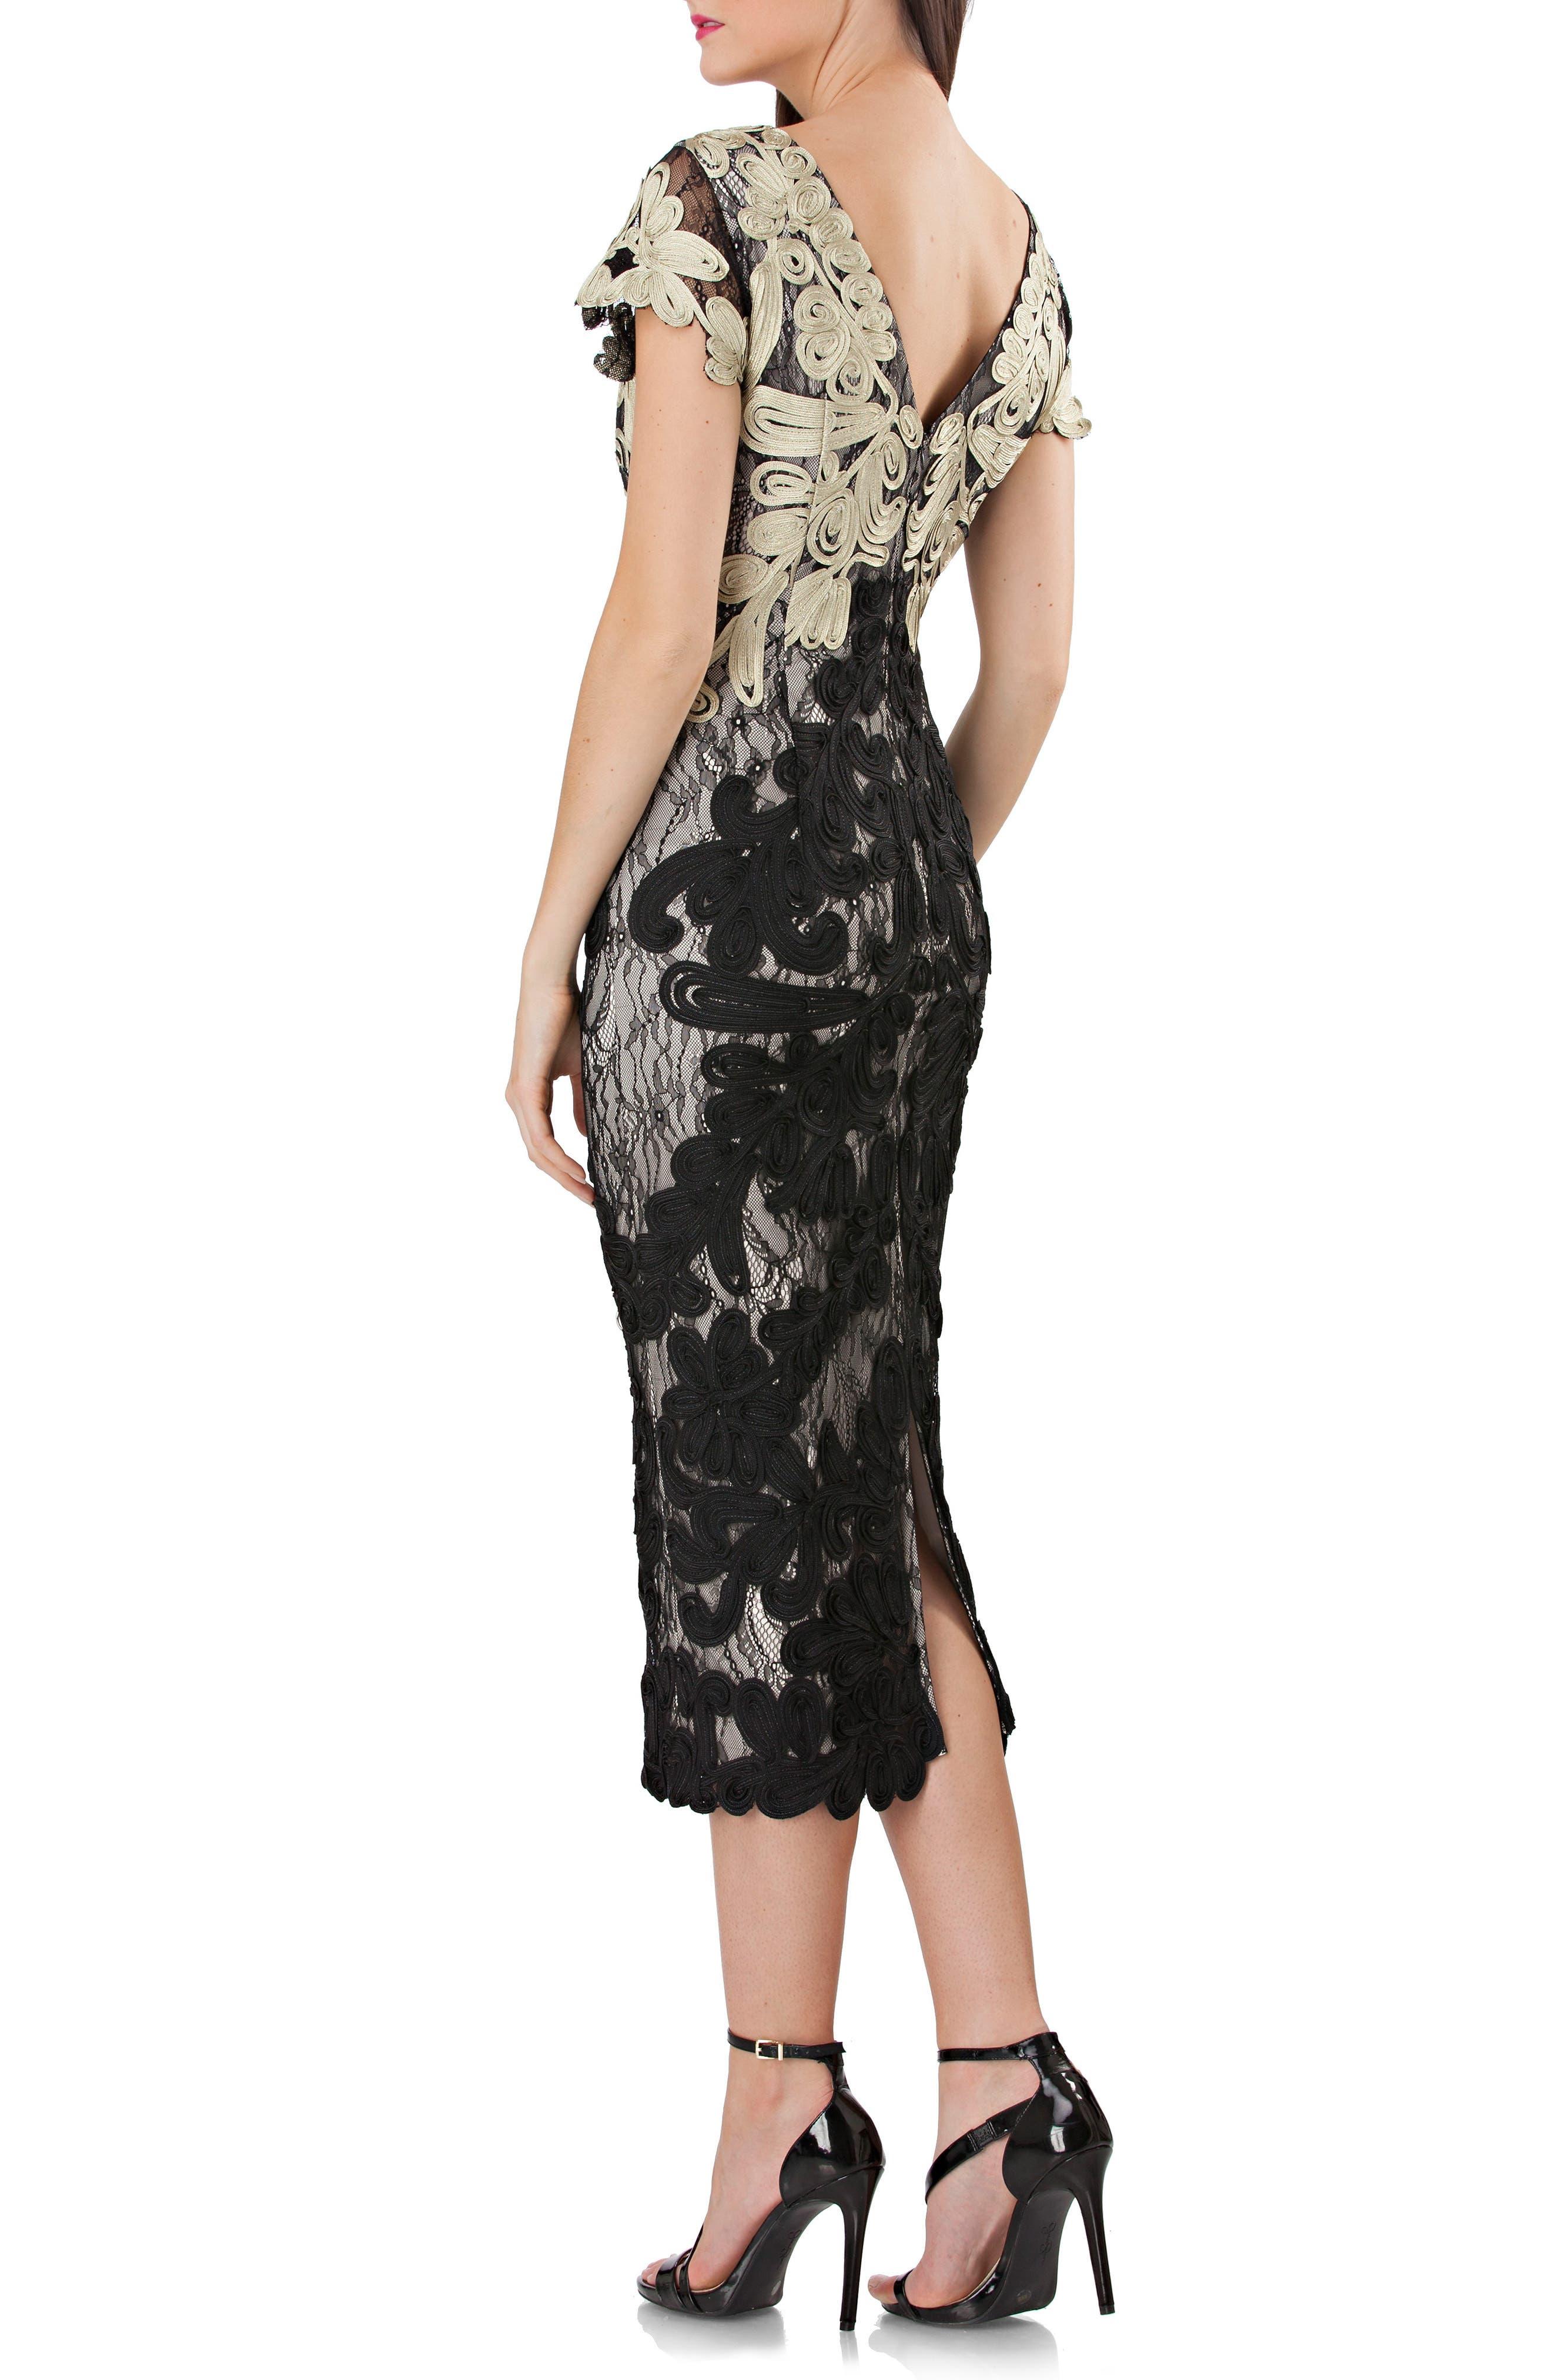 Womens Midi Dresses Nordstrom Bianca Top Leux Studio Silver L